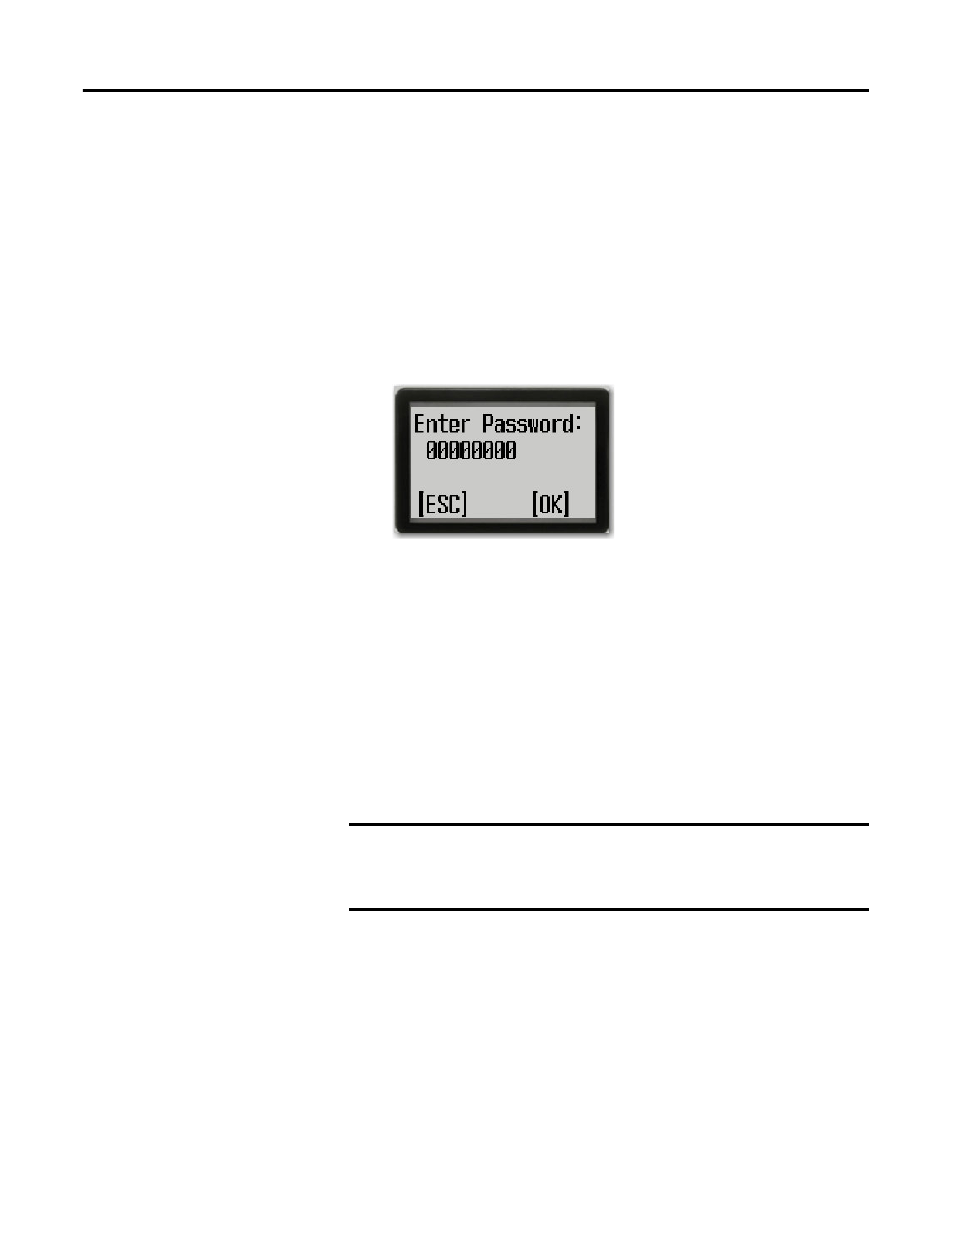 Activate password, Deactivate password, Activate password